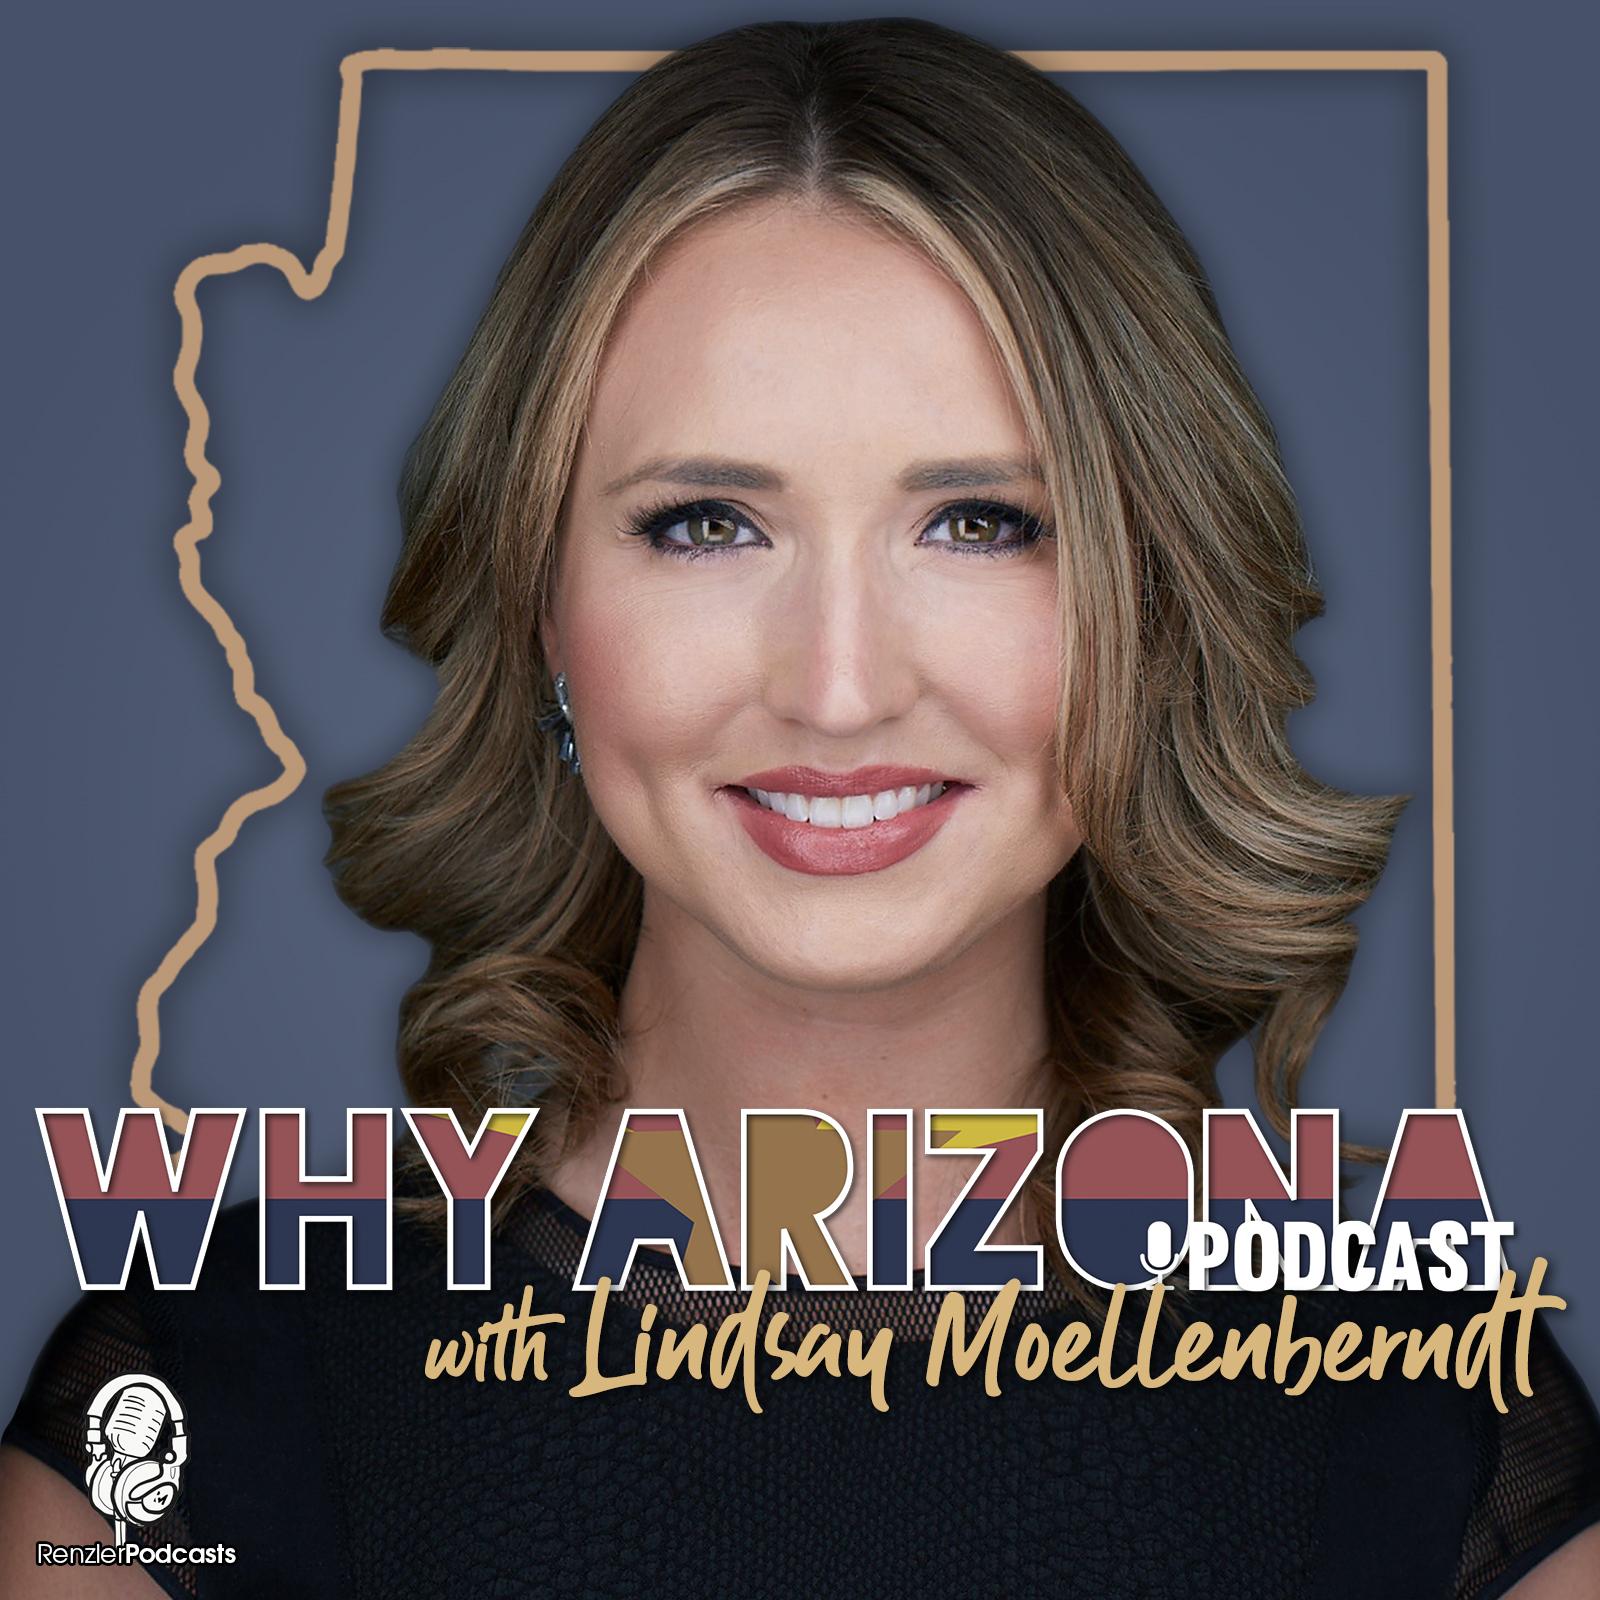 Why Arizona Podcast show art